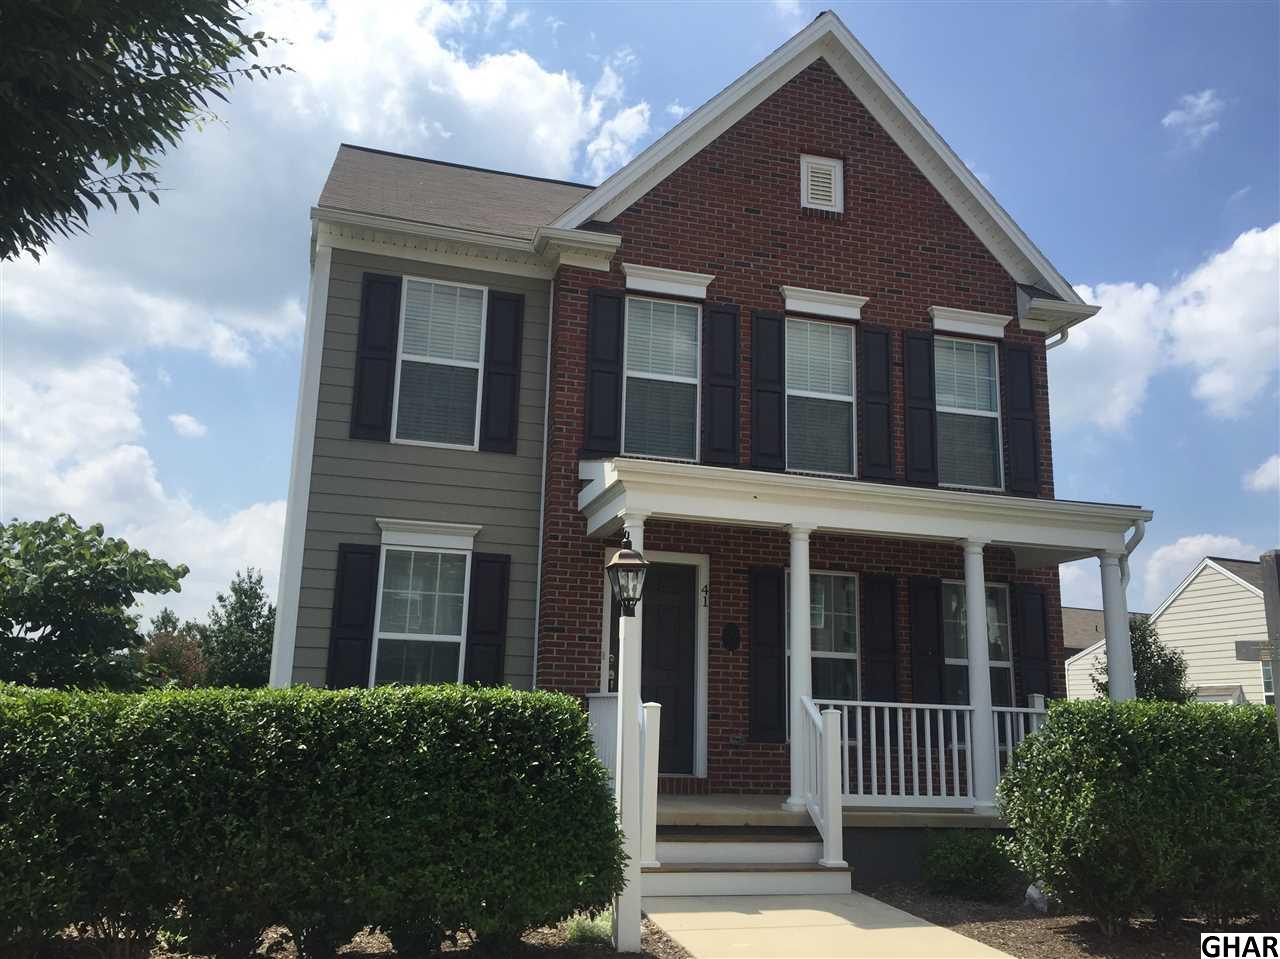 Rental Homes for Rent, ListingId:34488183, location: 41 Tavern House Hill Mechanicsburg 17050